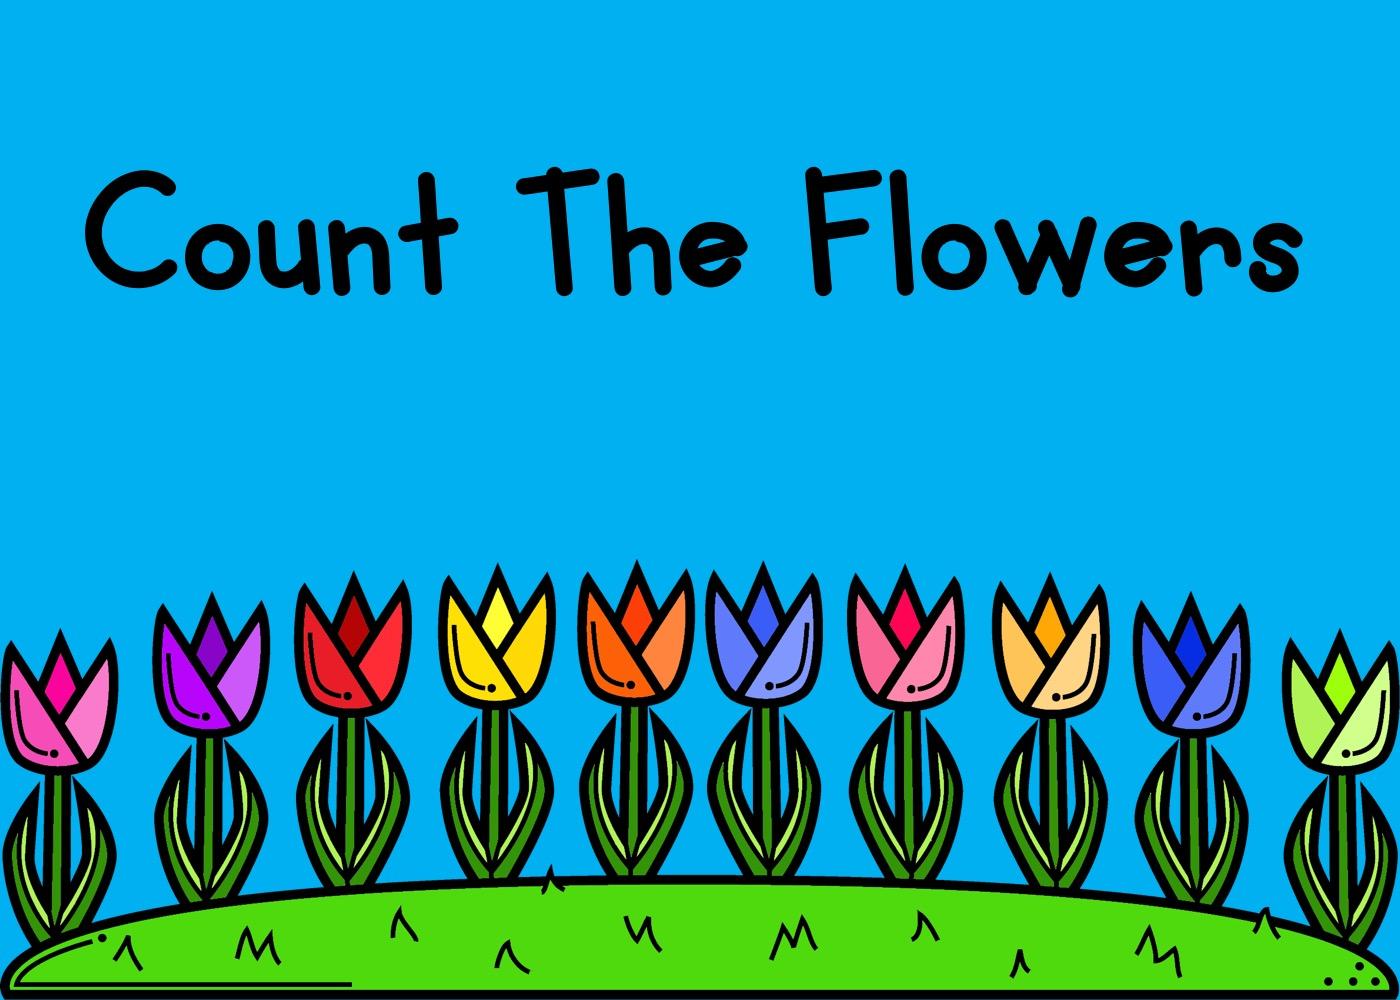 Fun Flower Printables for Preschool and Kindergarten   Spring Themed Math Games   Hands On Math Homeschool Activities   Kids Classroom Center Ideas and Worksheets #FreePrintableWorksheetsForKids #flower #spring #clipcards